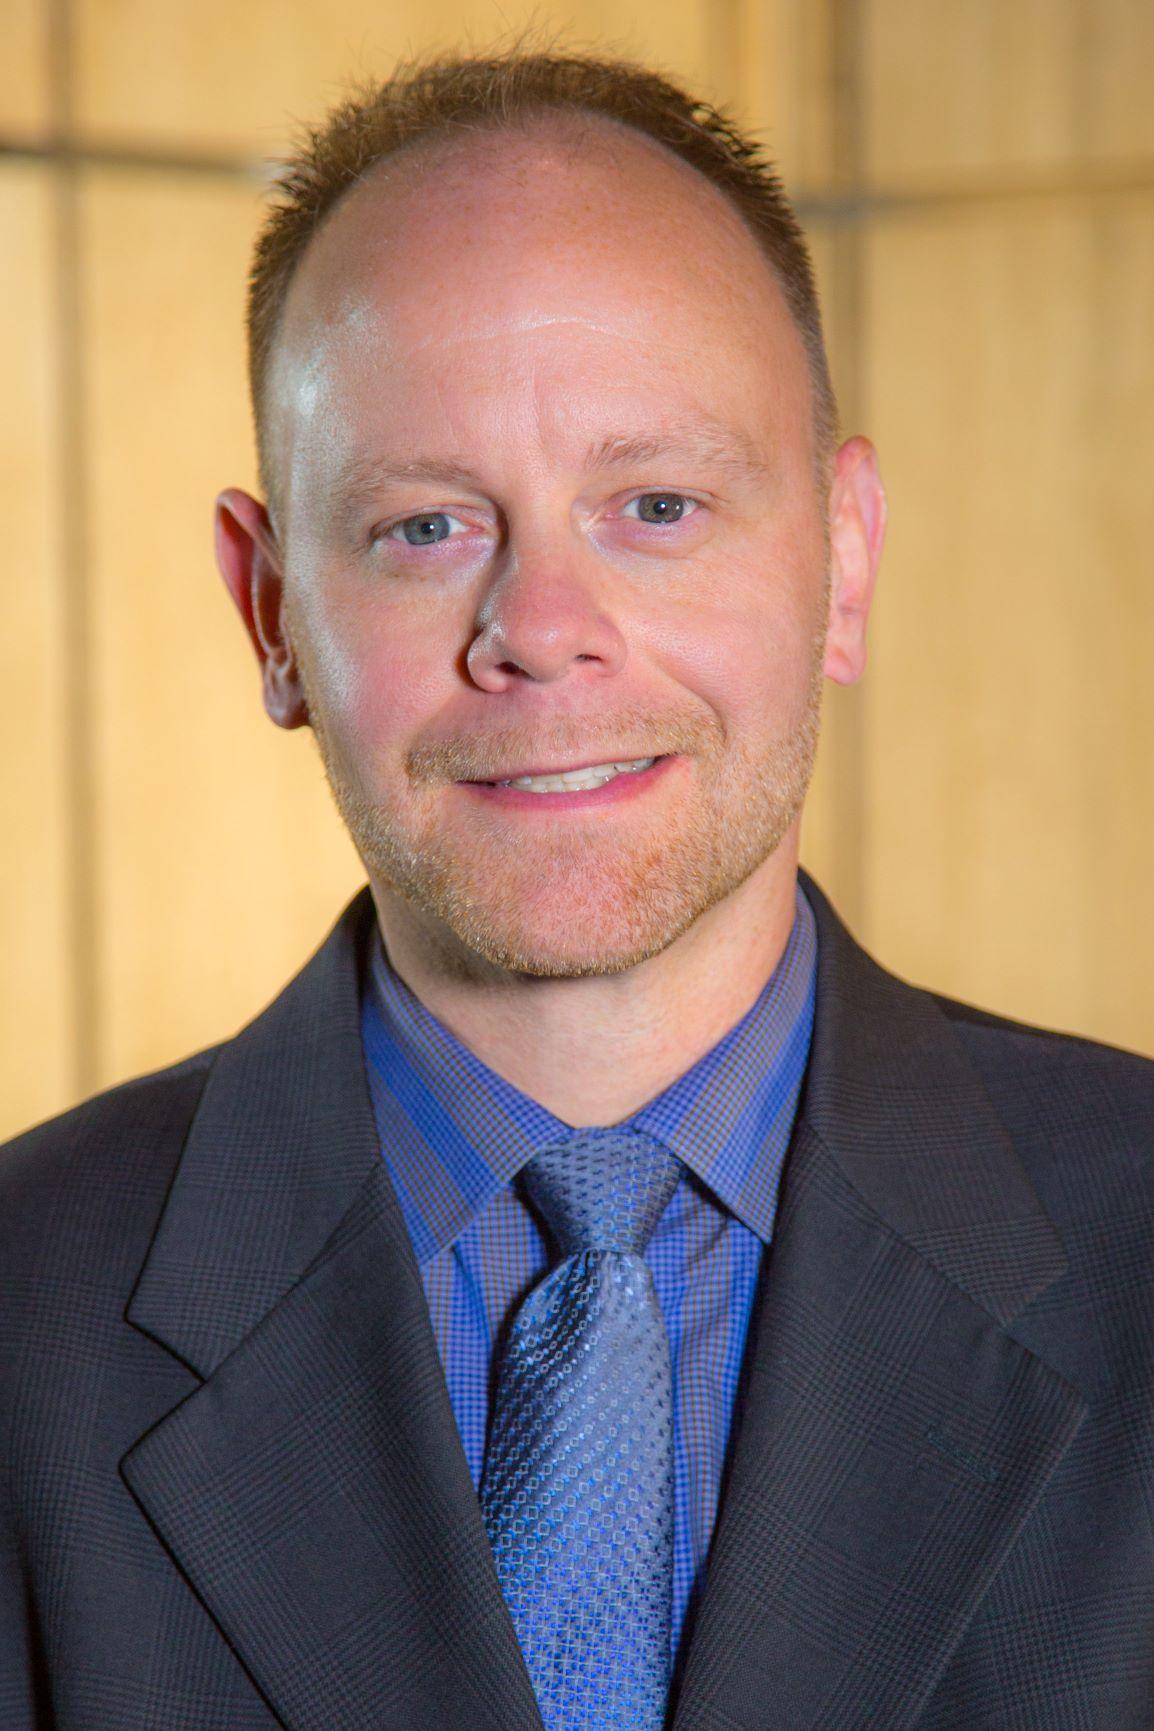 Jim Kirby, PharmD, BCPS, CDE